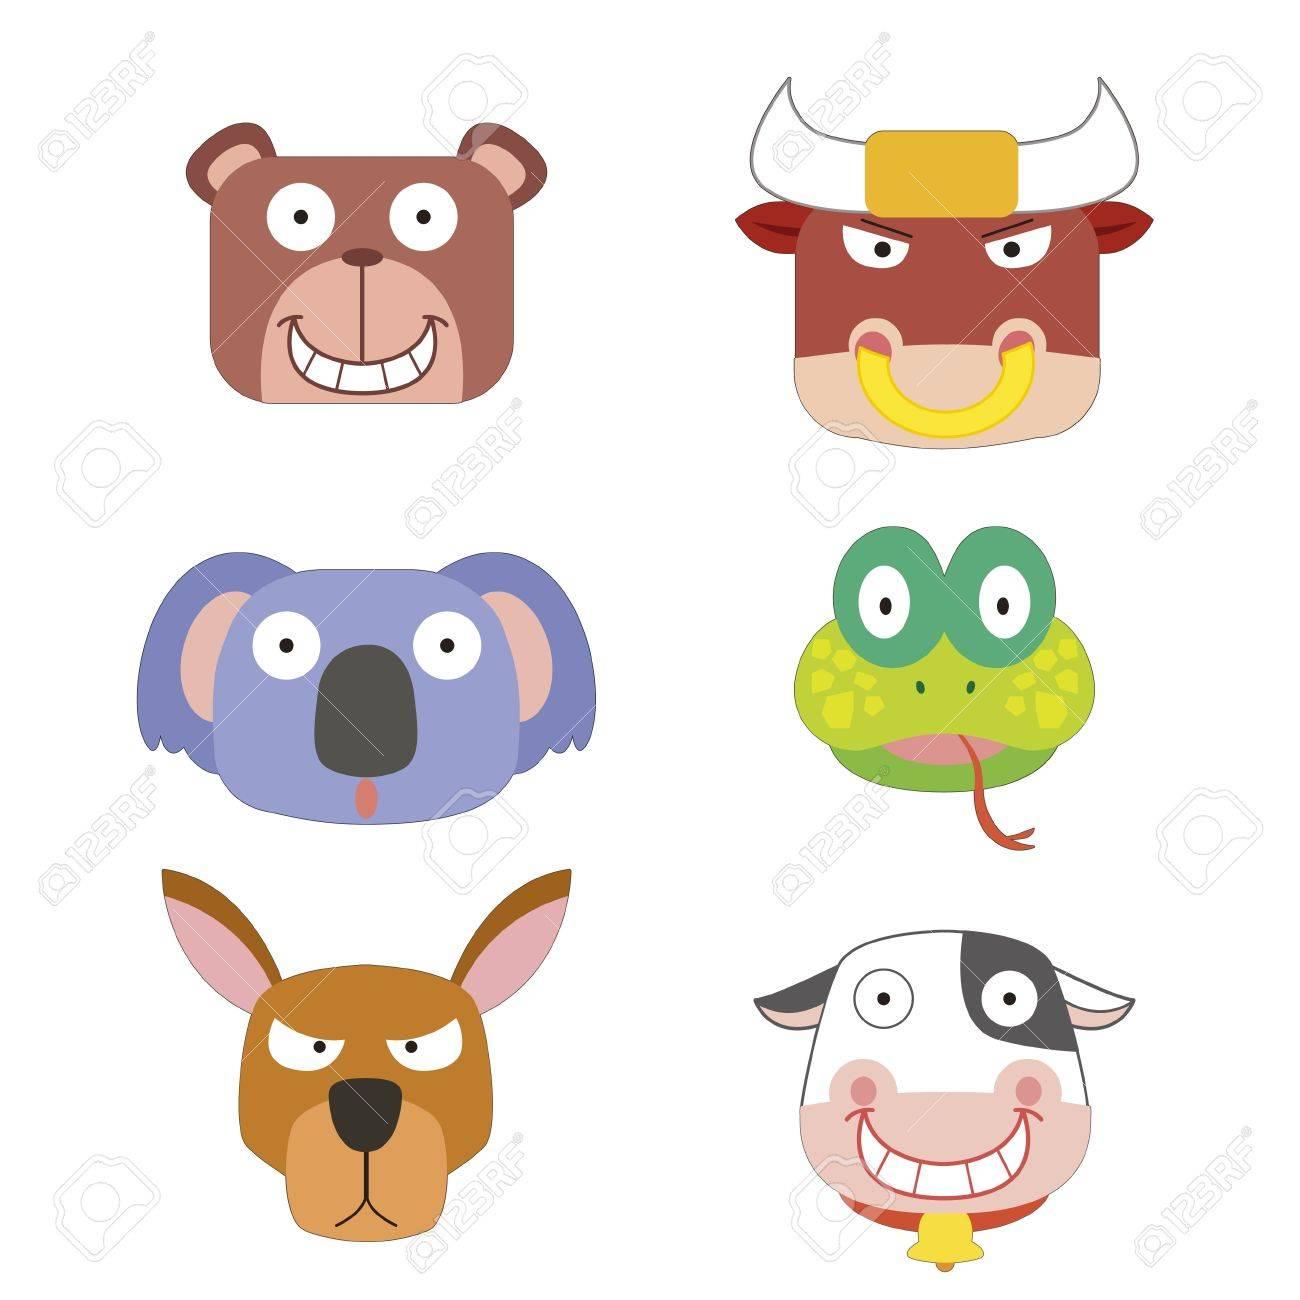 six cute cartoon animal head icons Stock Vector - 17274709